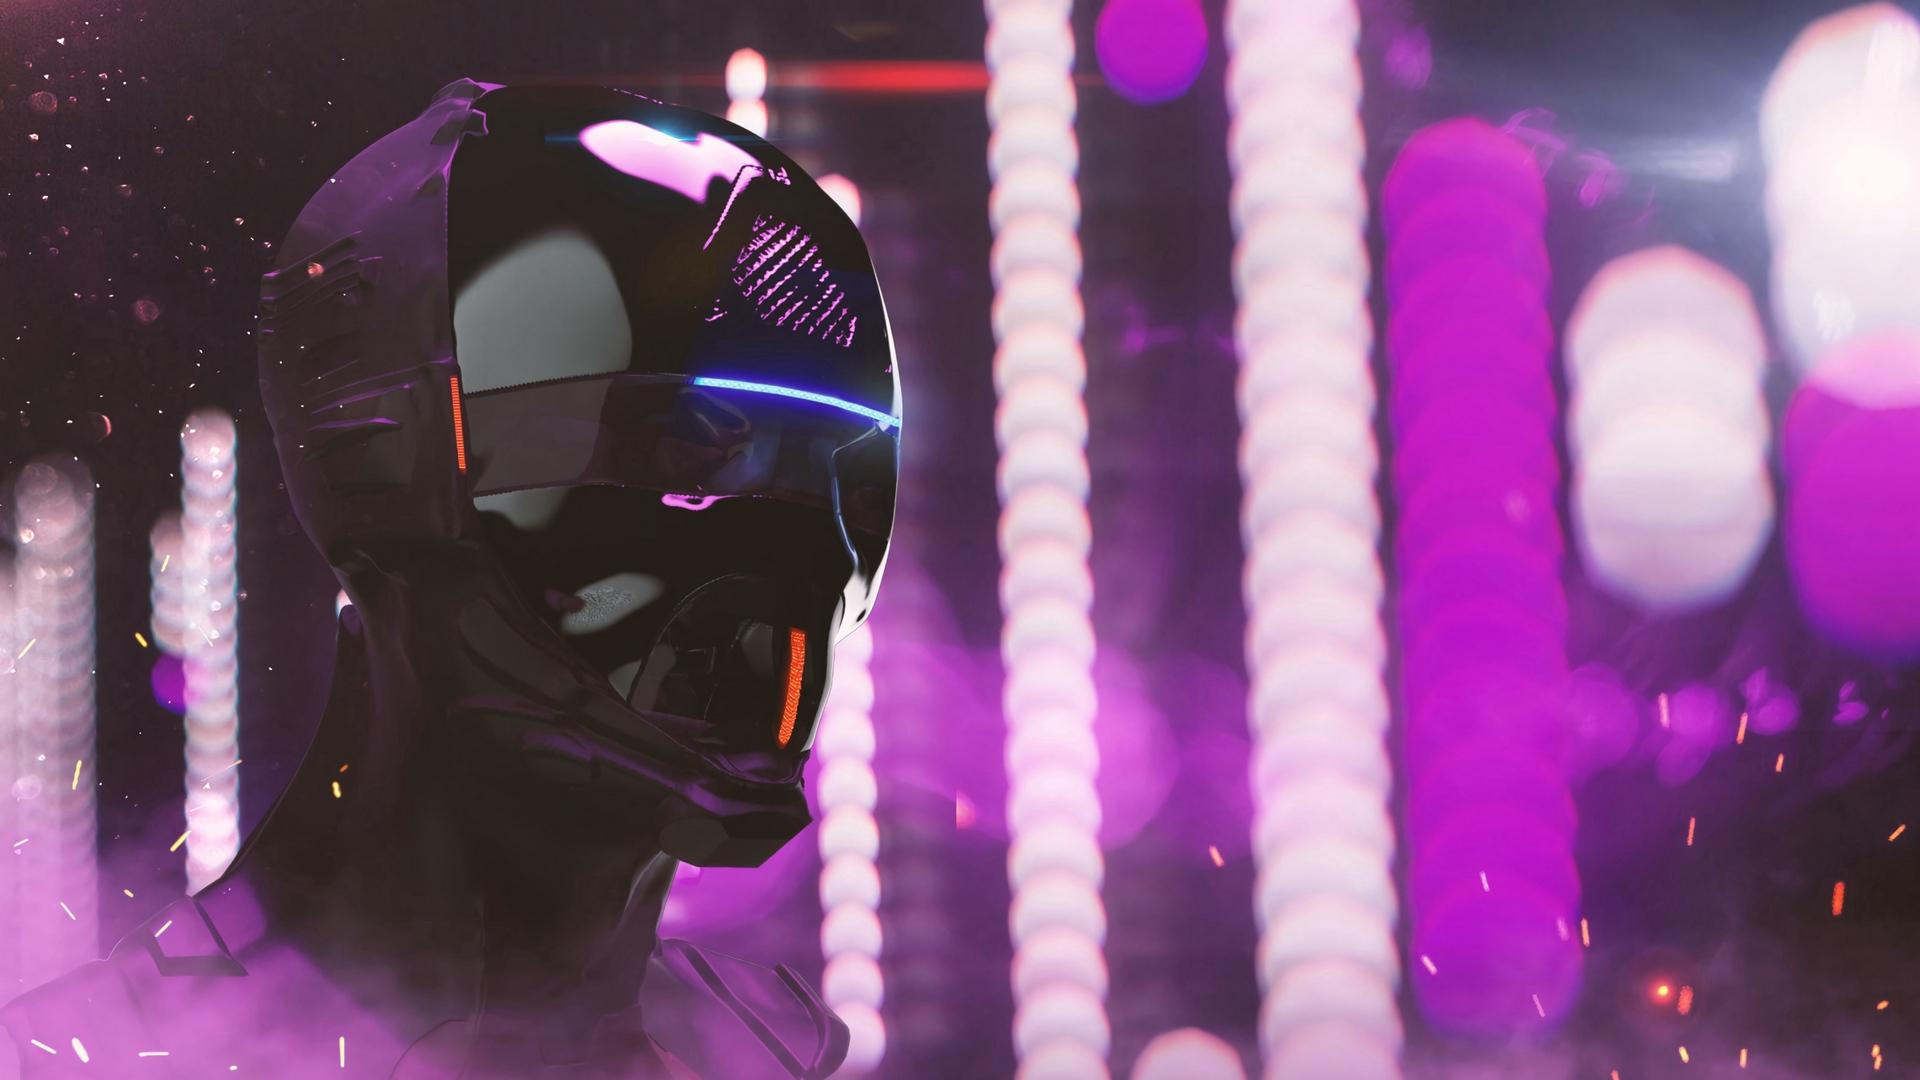 Cyberpunk Mask full hd 1080p wallpaper